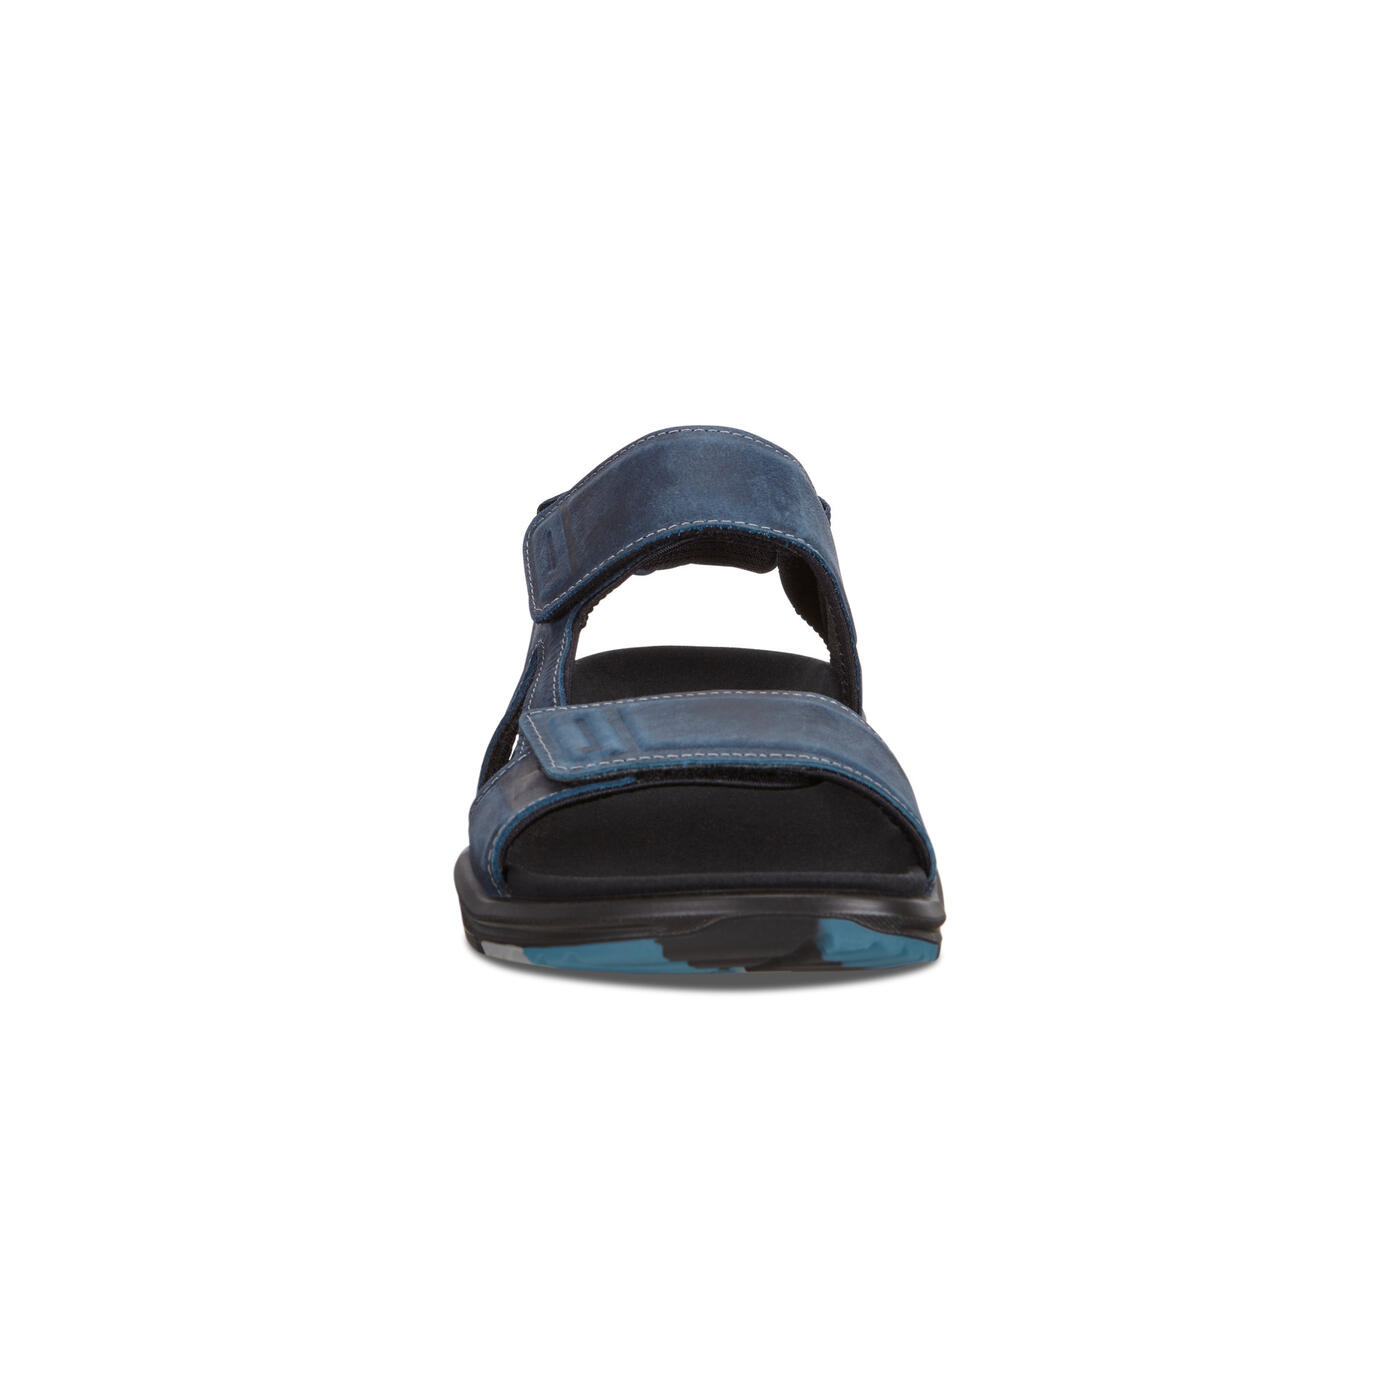 ECCO X-TRINSIC Flat Sandal